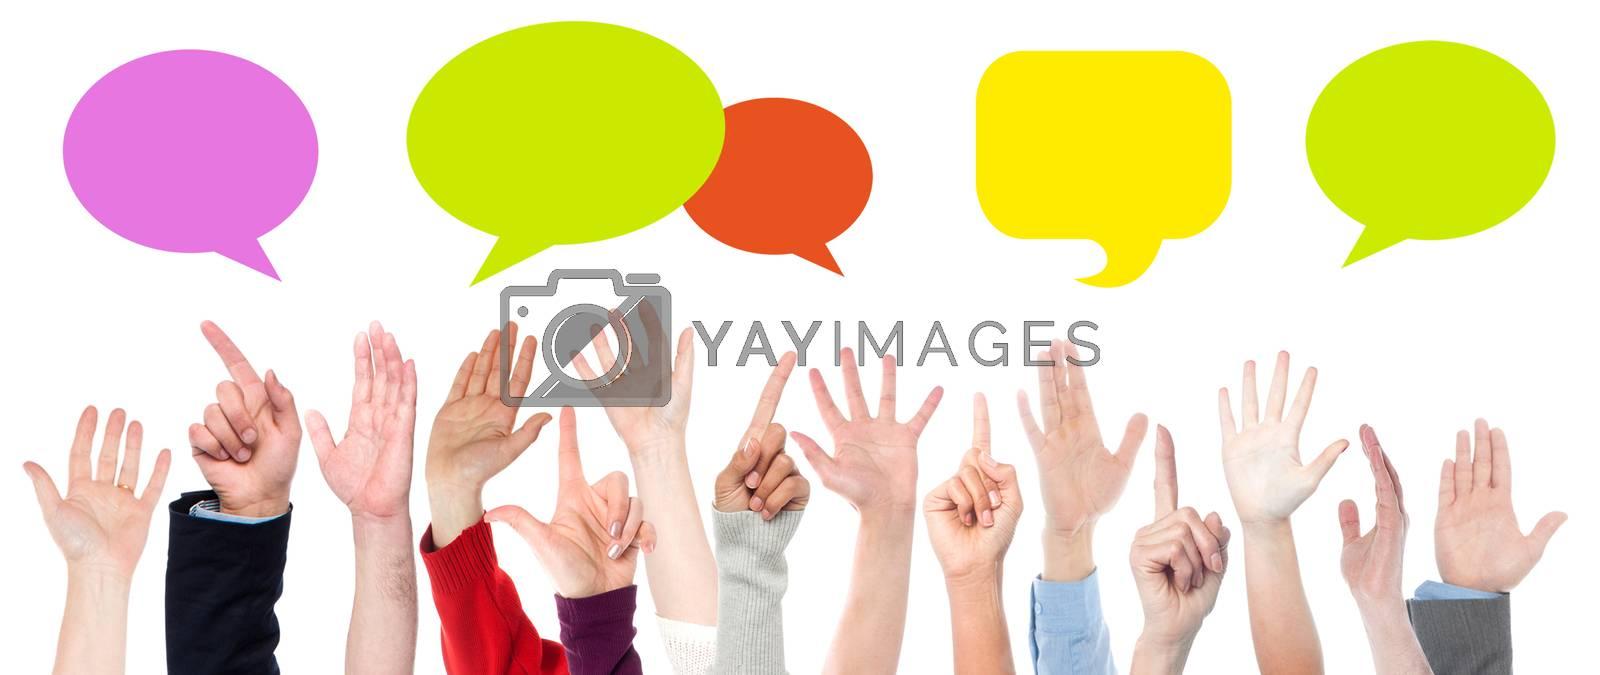 Hands raised up. Colorful speech bubbles.